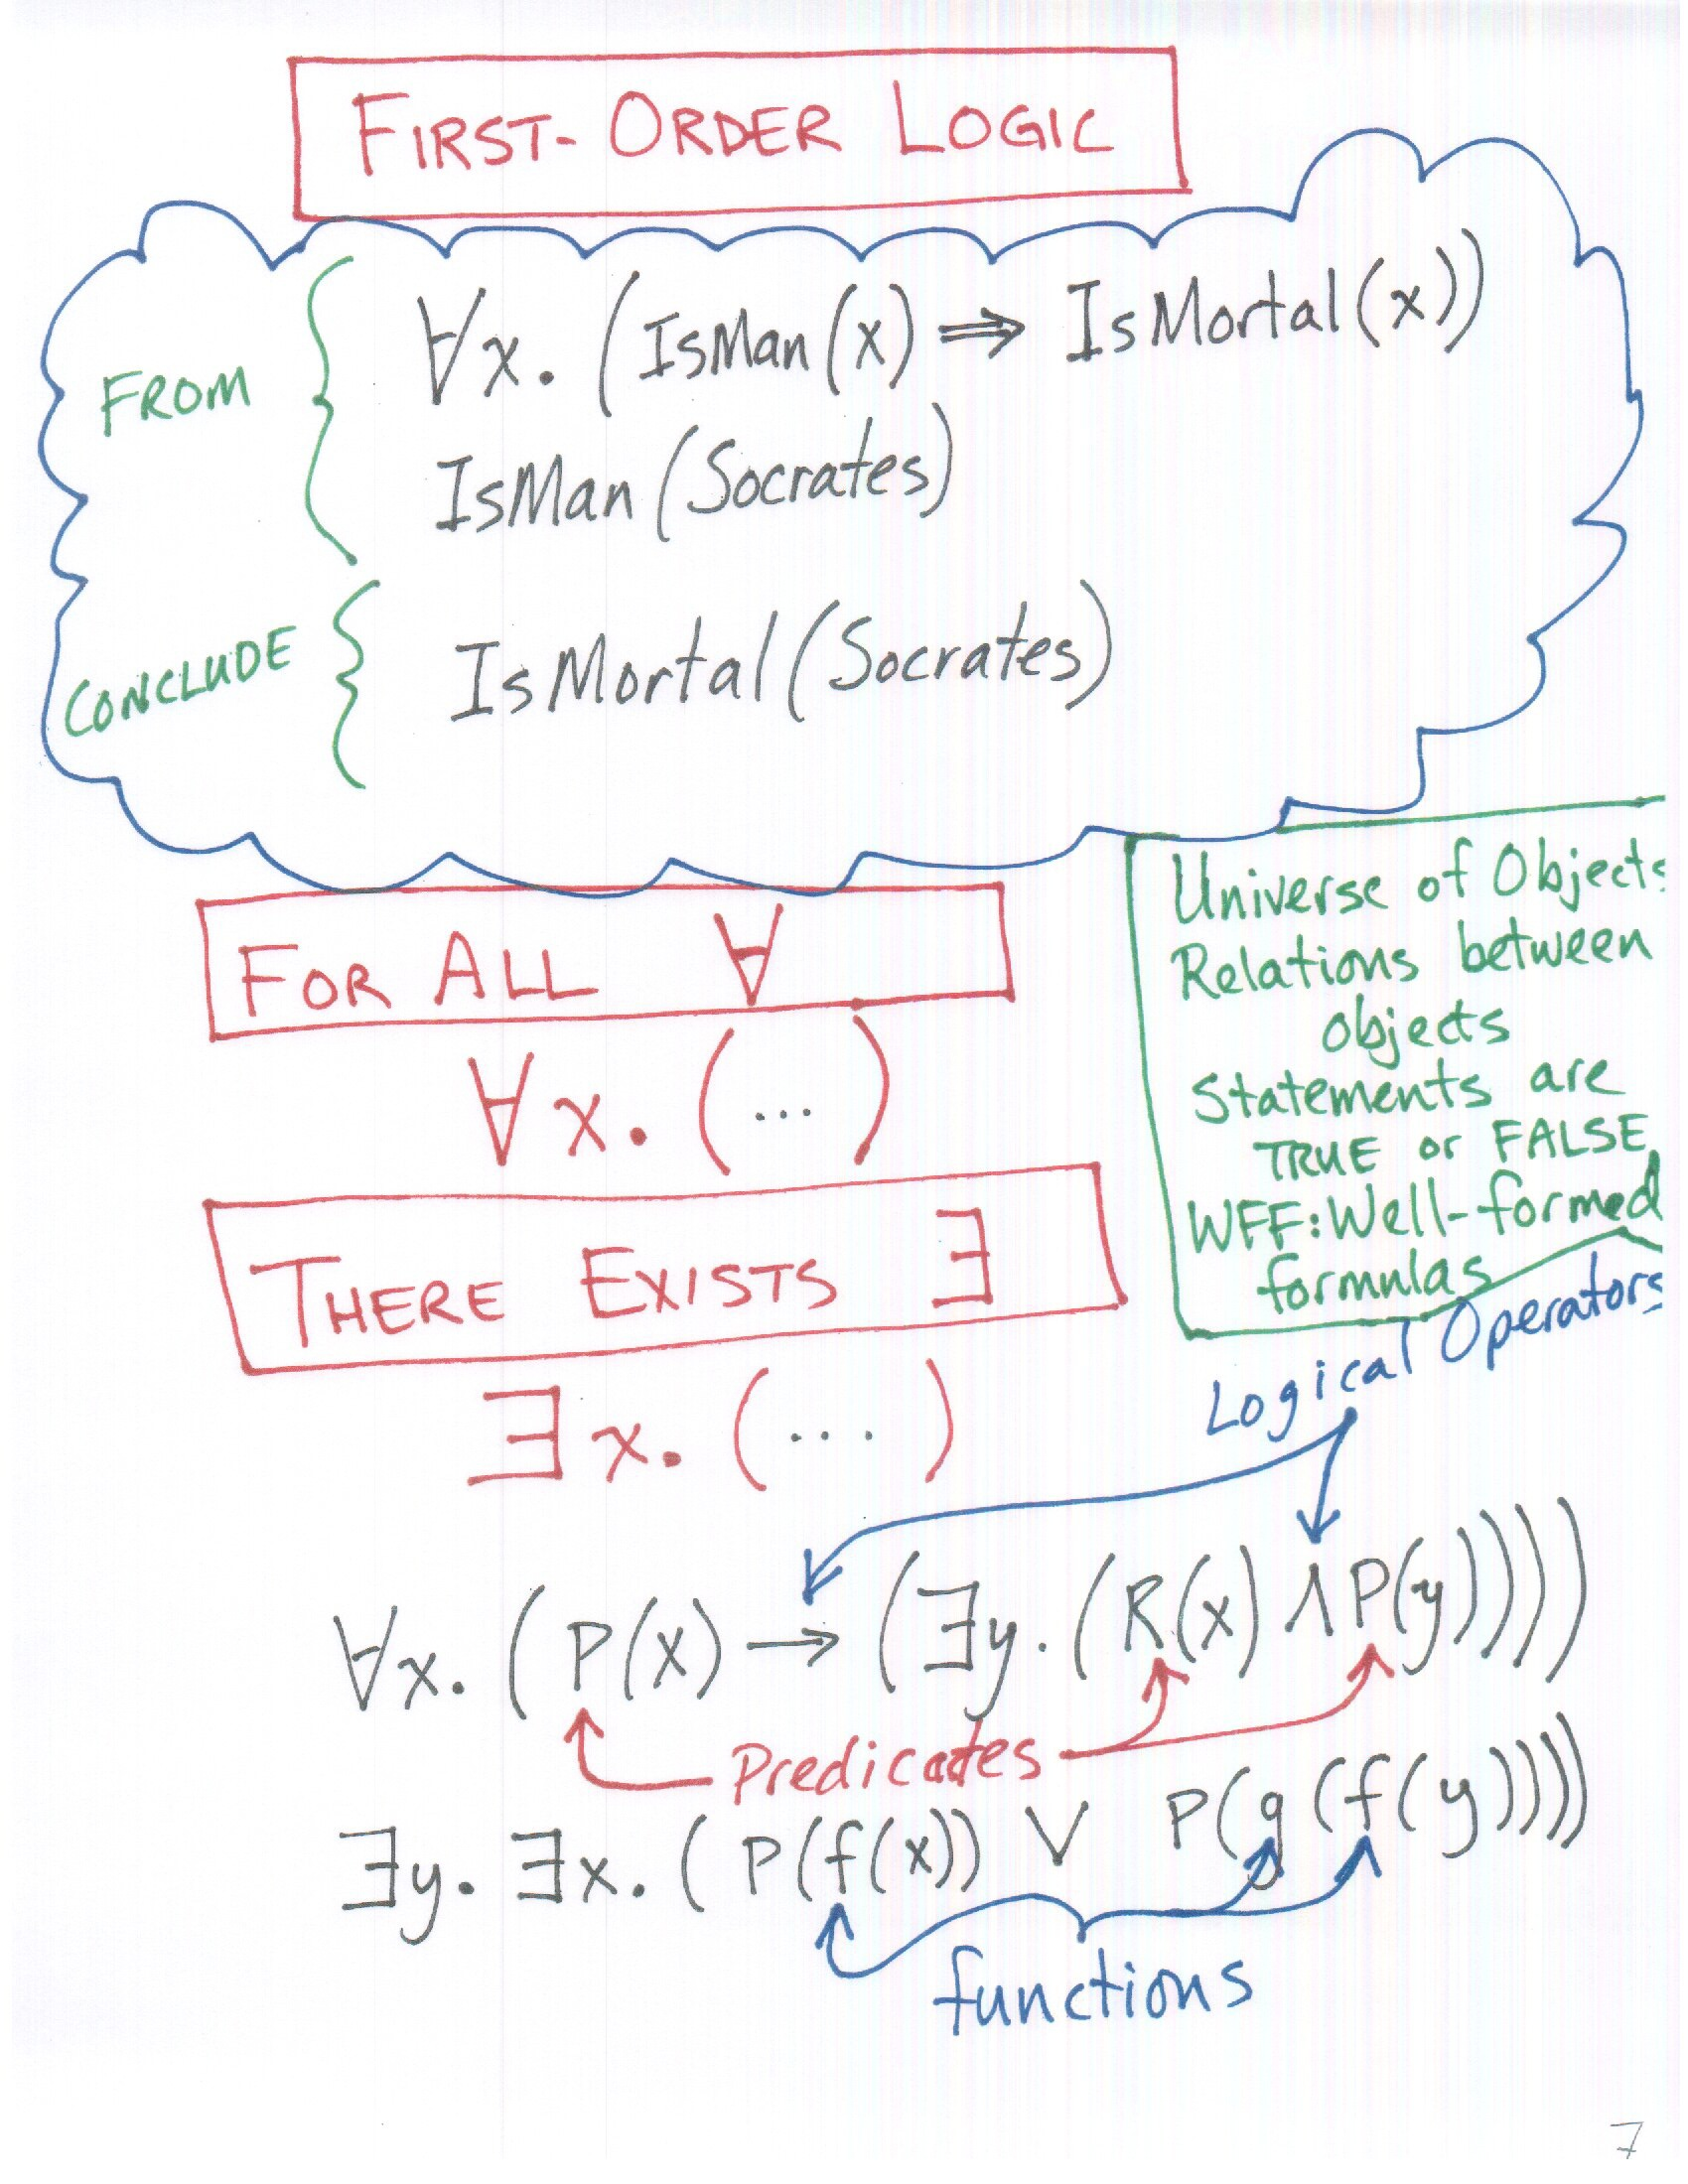 http://web.cecs.pdx.edu/~harry/TheoryOfComp/slides/chapter0/slide%206.jpeg